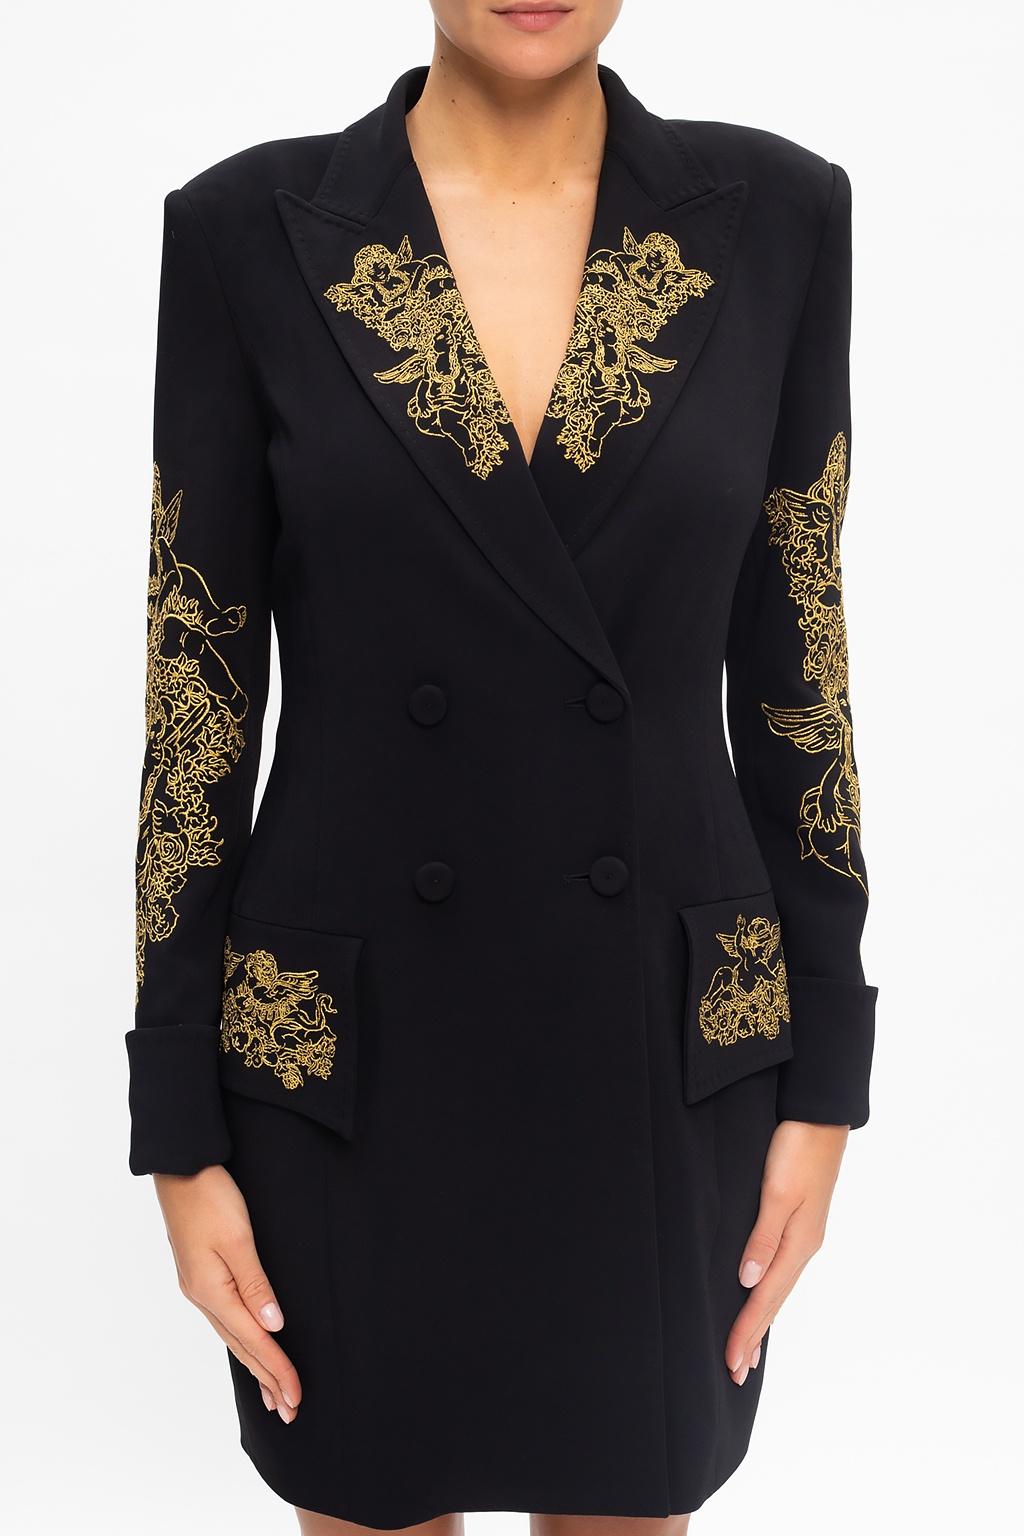 moschino dress,